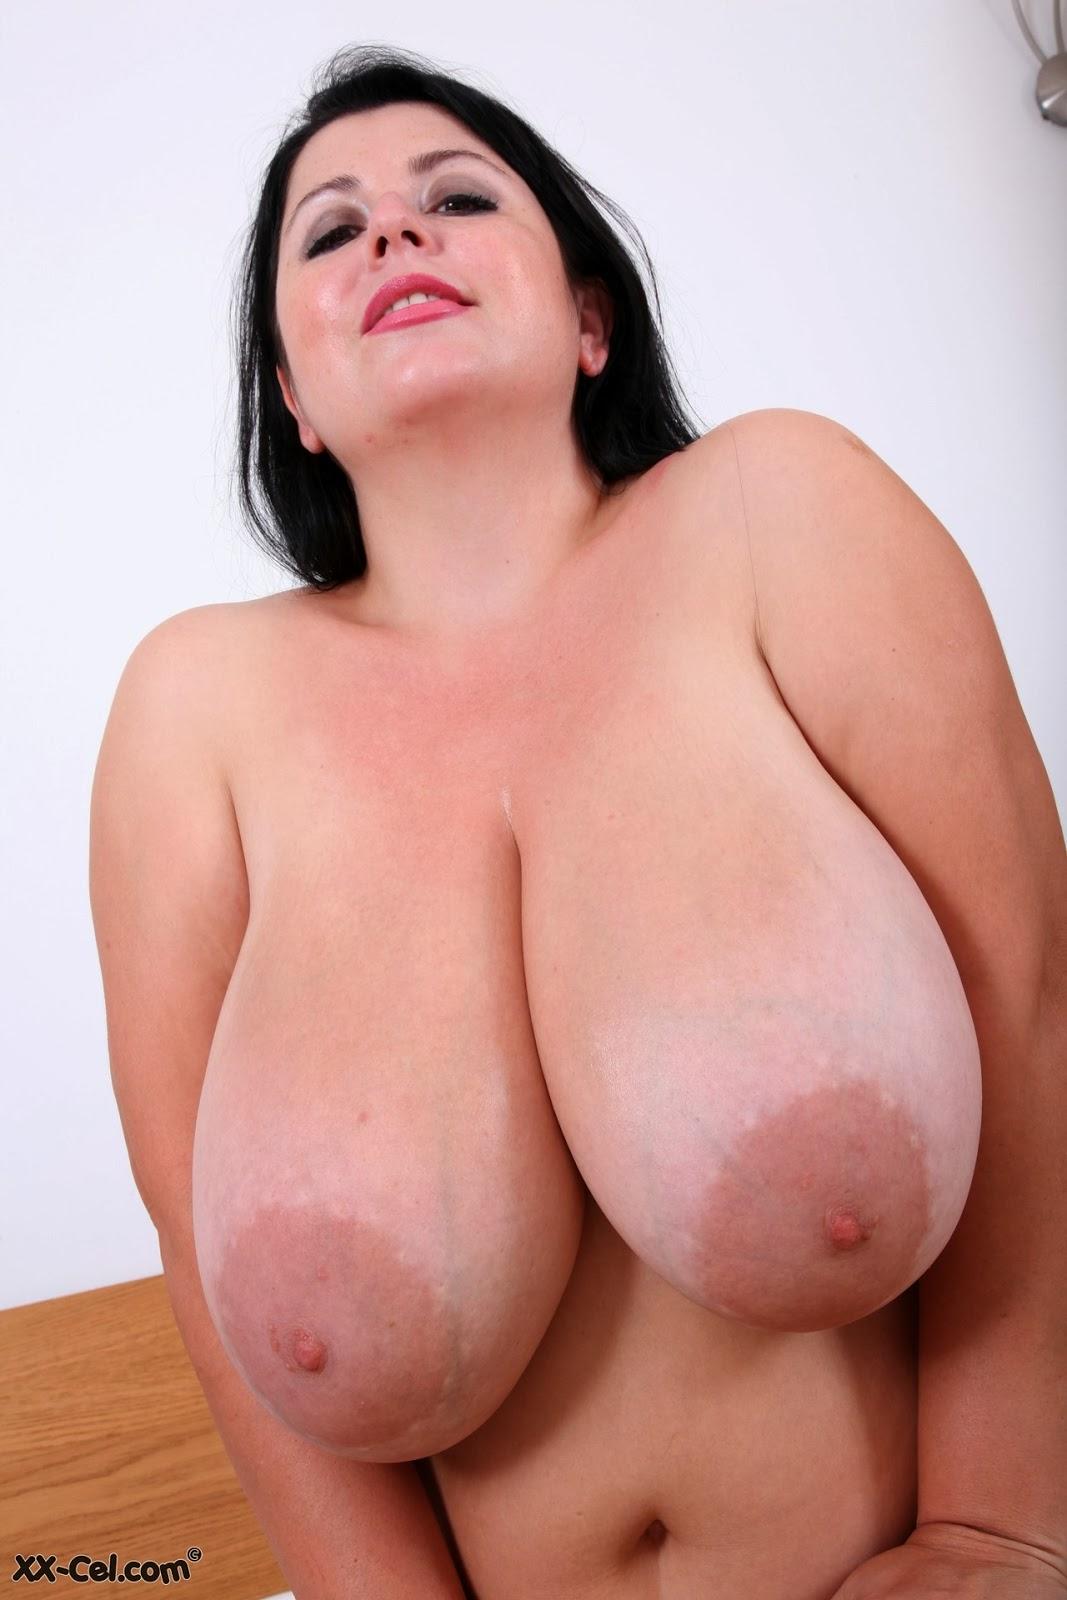 Antonella Kahtlo Porn download sex pics antonella kahllo bra sex porn images